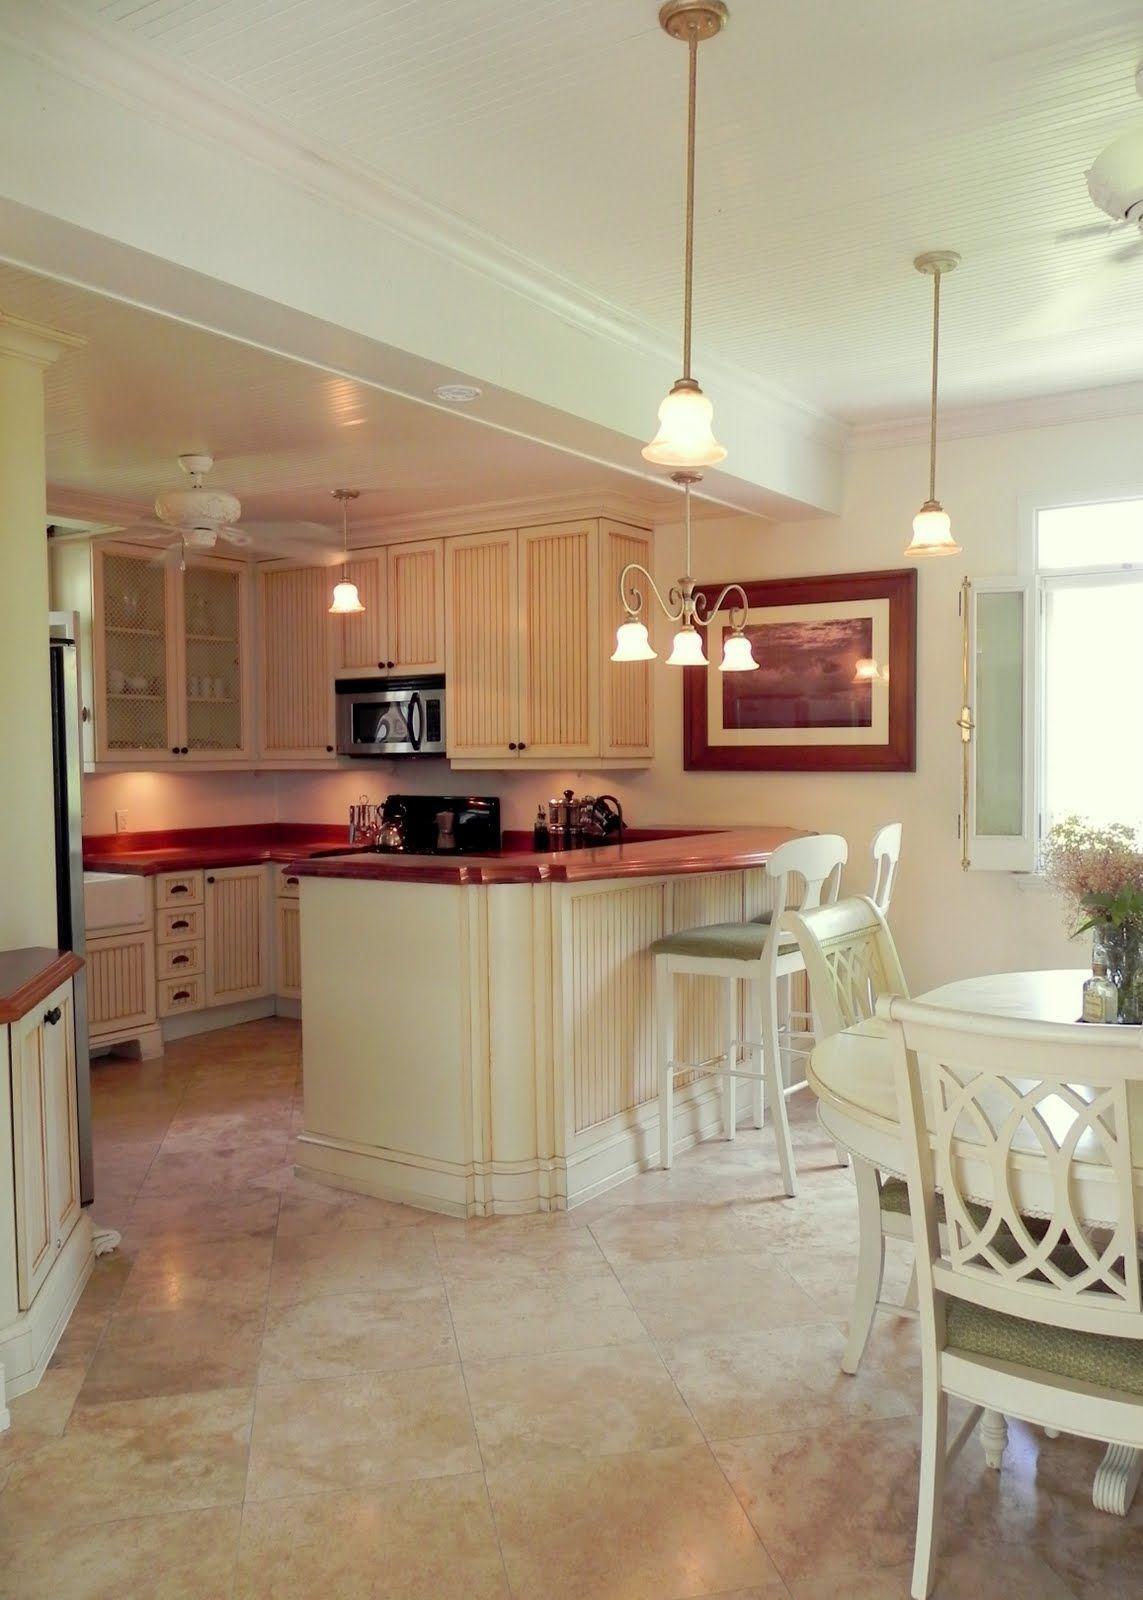 Pepper key stacie wednesday woodworks glazed kitchen cabinetry